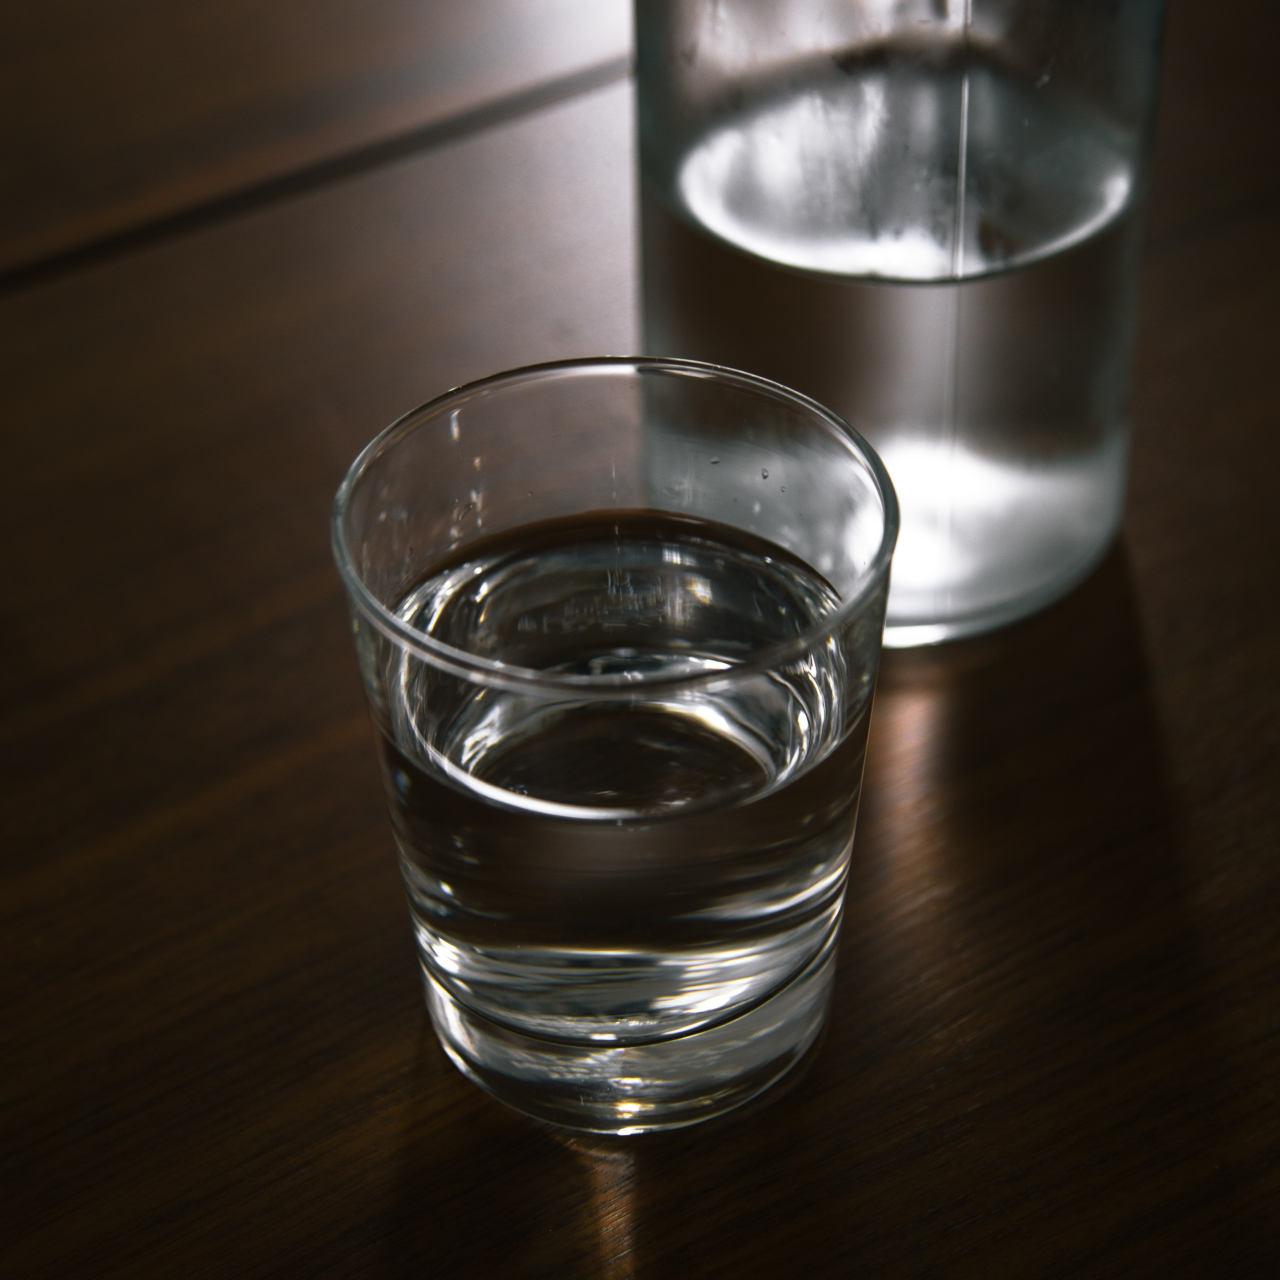 Watercharles-deluvio-R0fGMKUTqps-unsplash.jpg